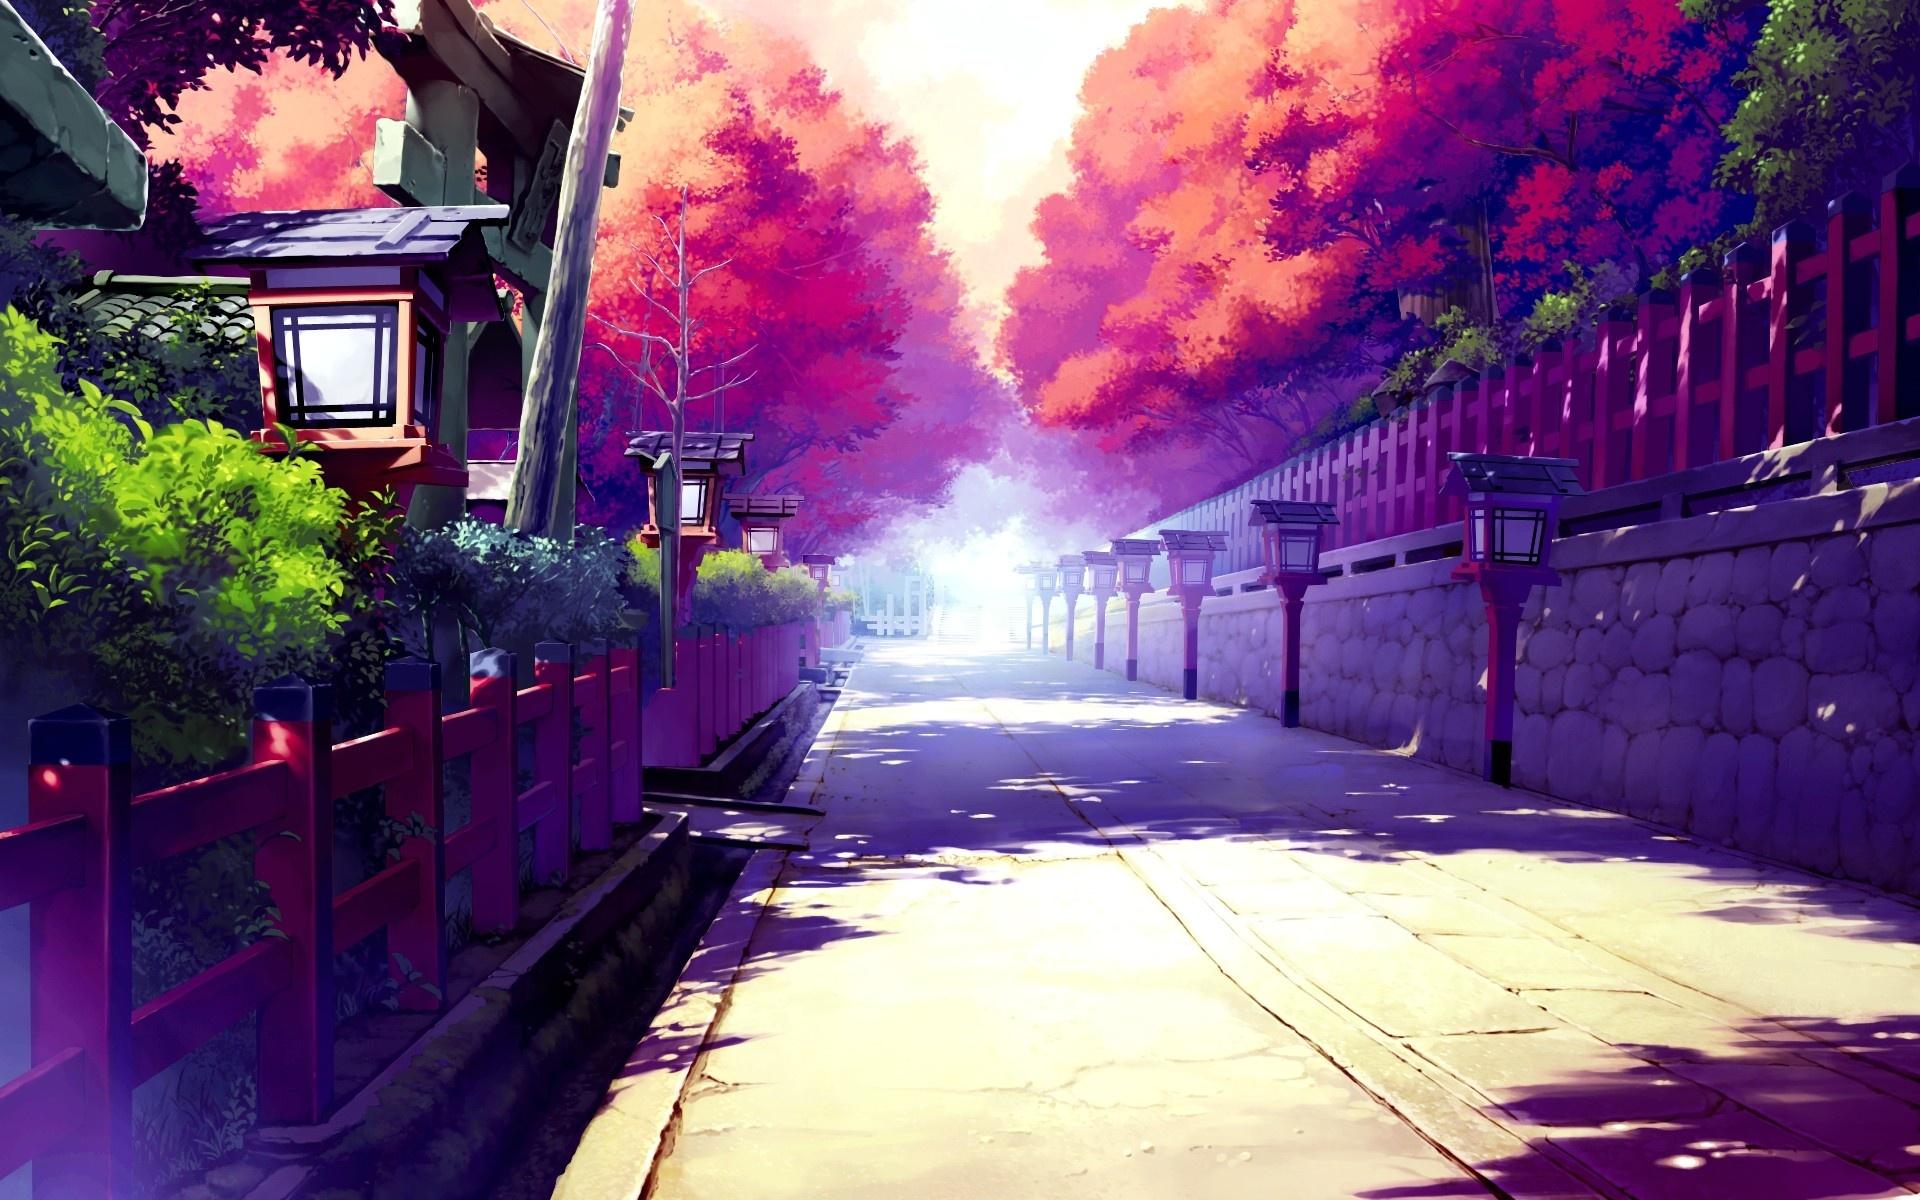 Free HD & 3D Wallpapers: Japanese Anime Street HD Wallpaper Image